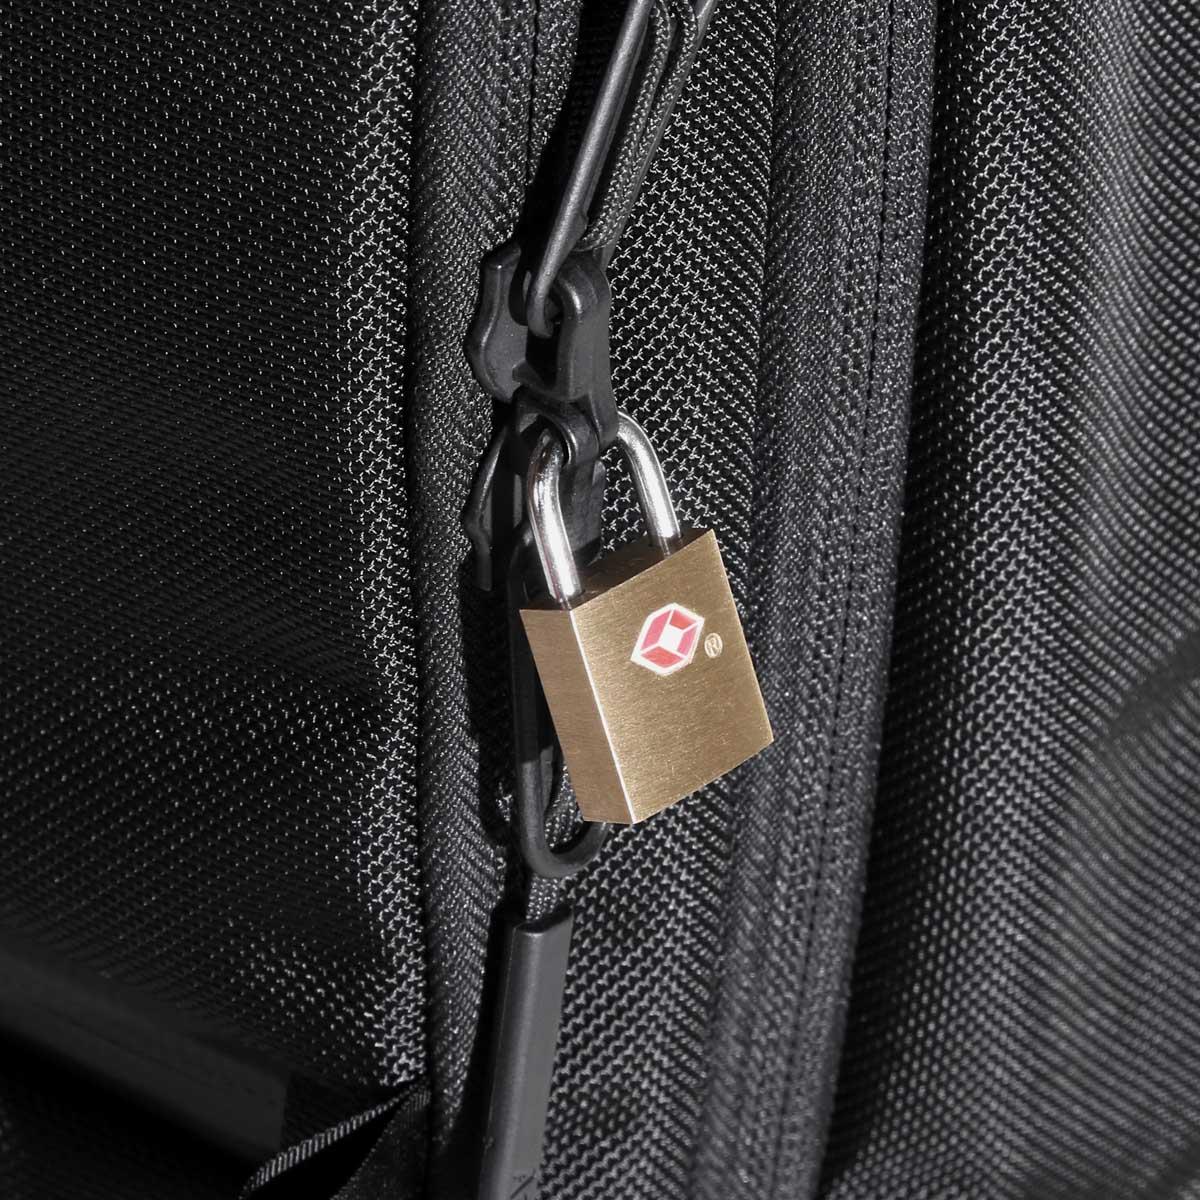 AER21022_travelpack2small_lock.jpg